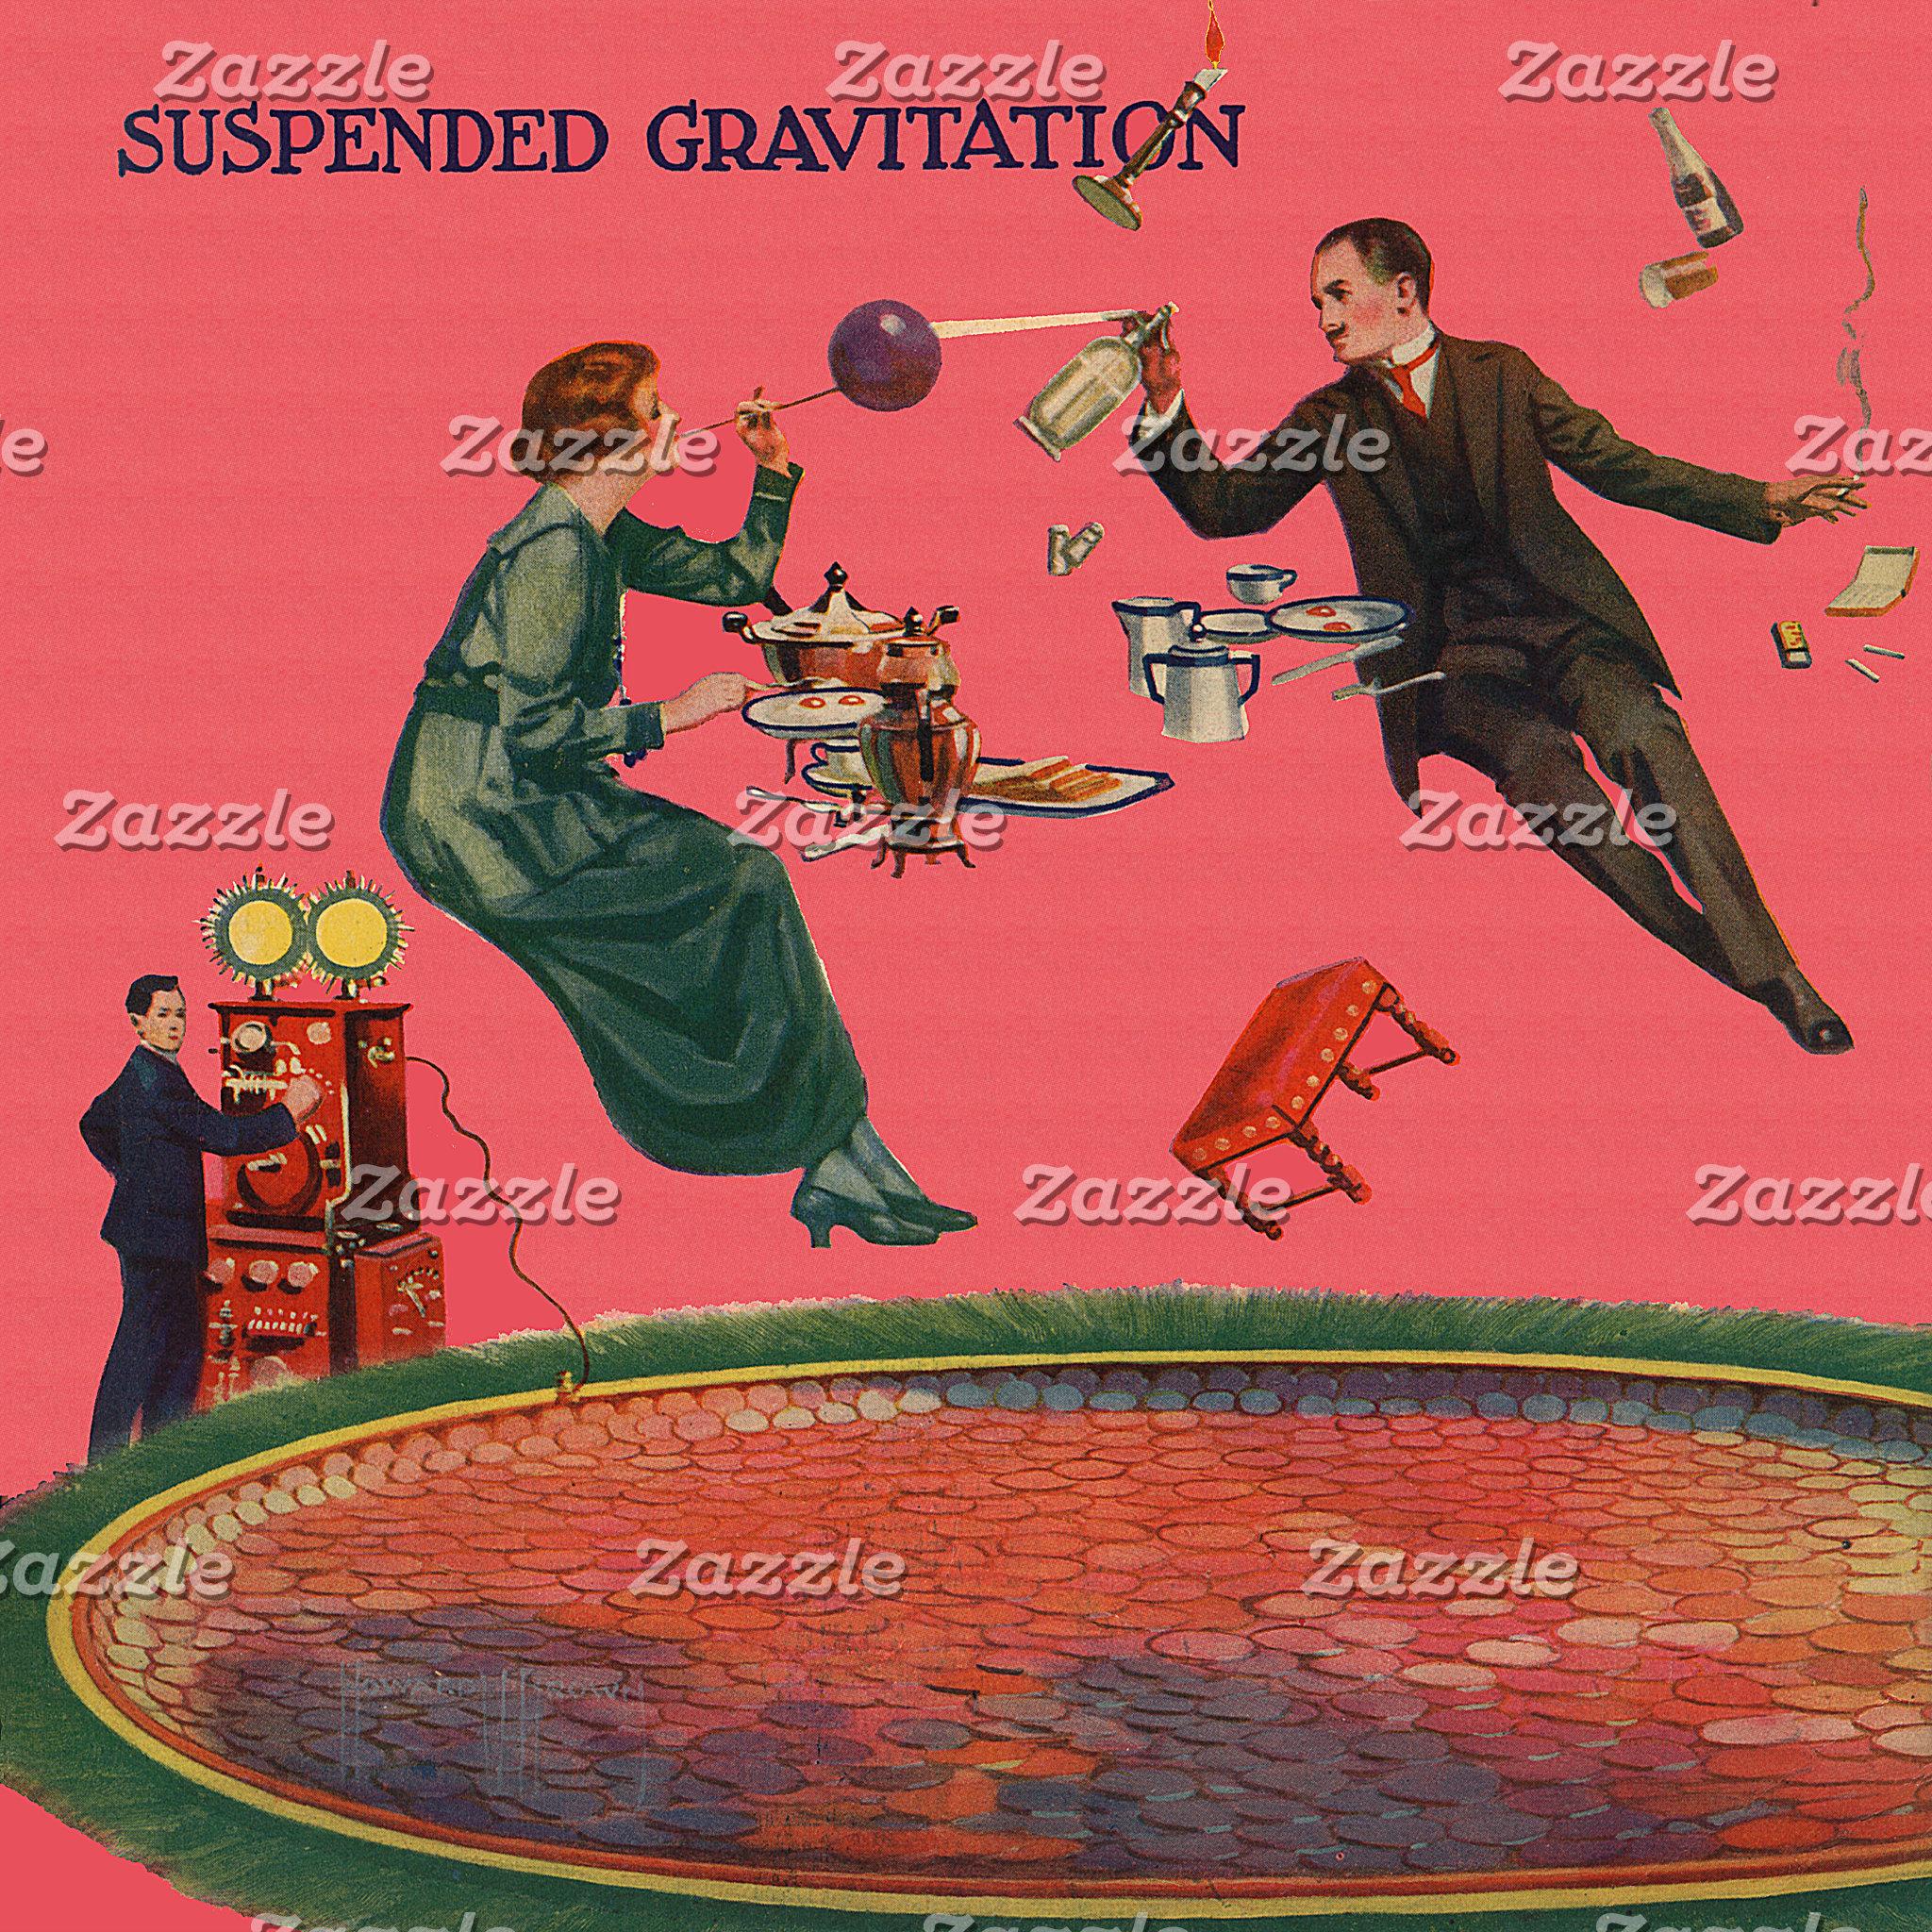 Suspended Gravitation